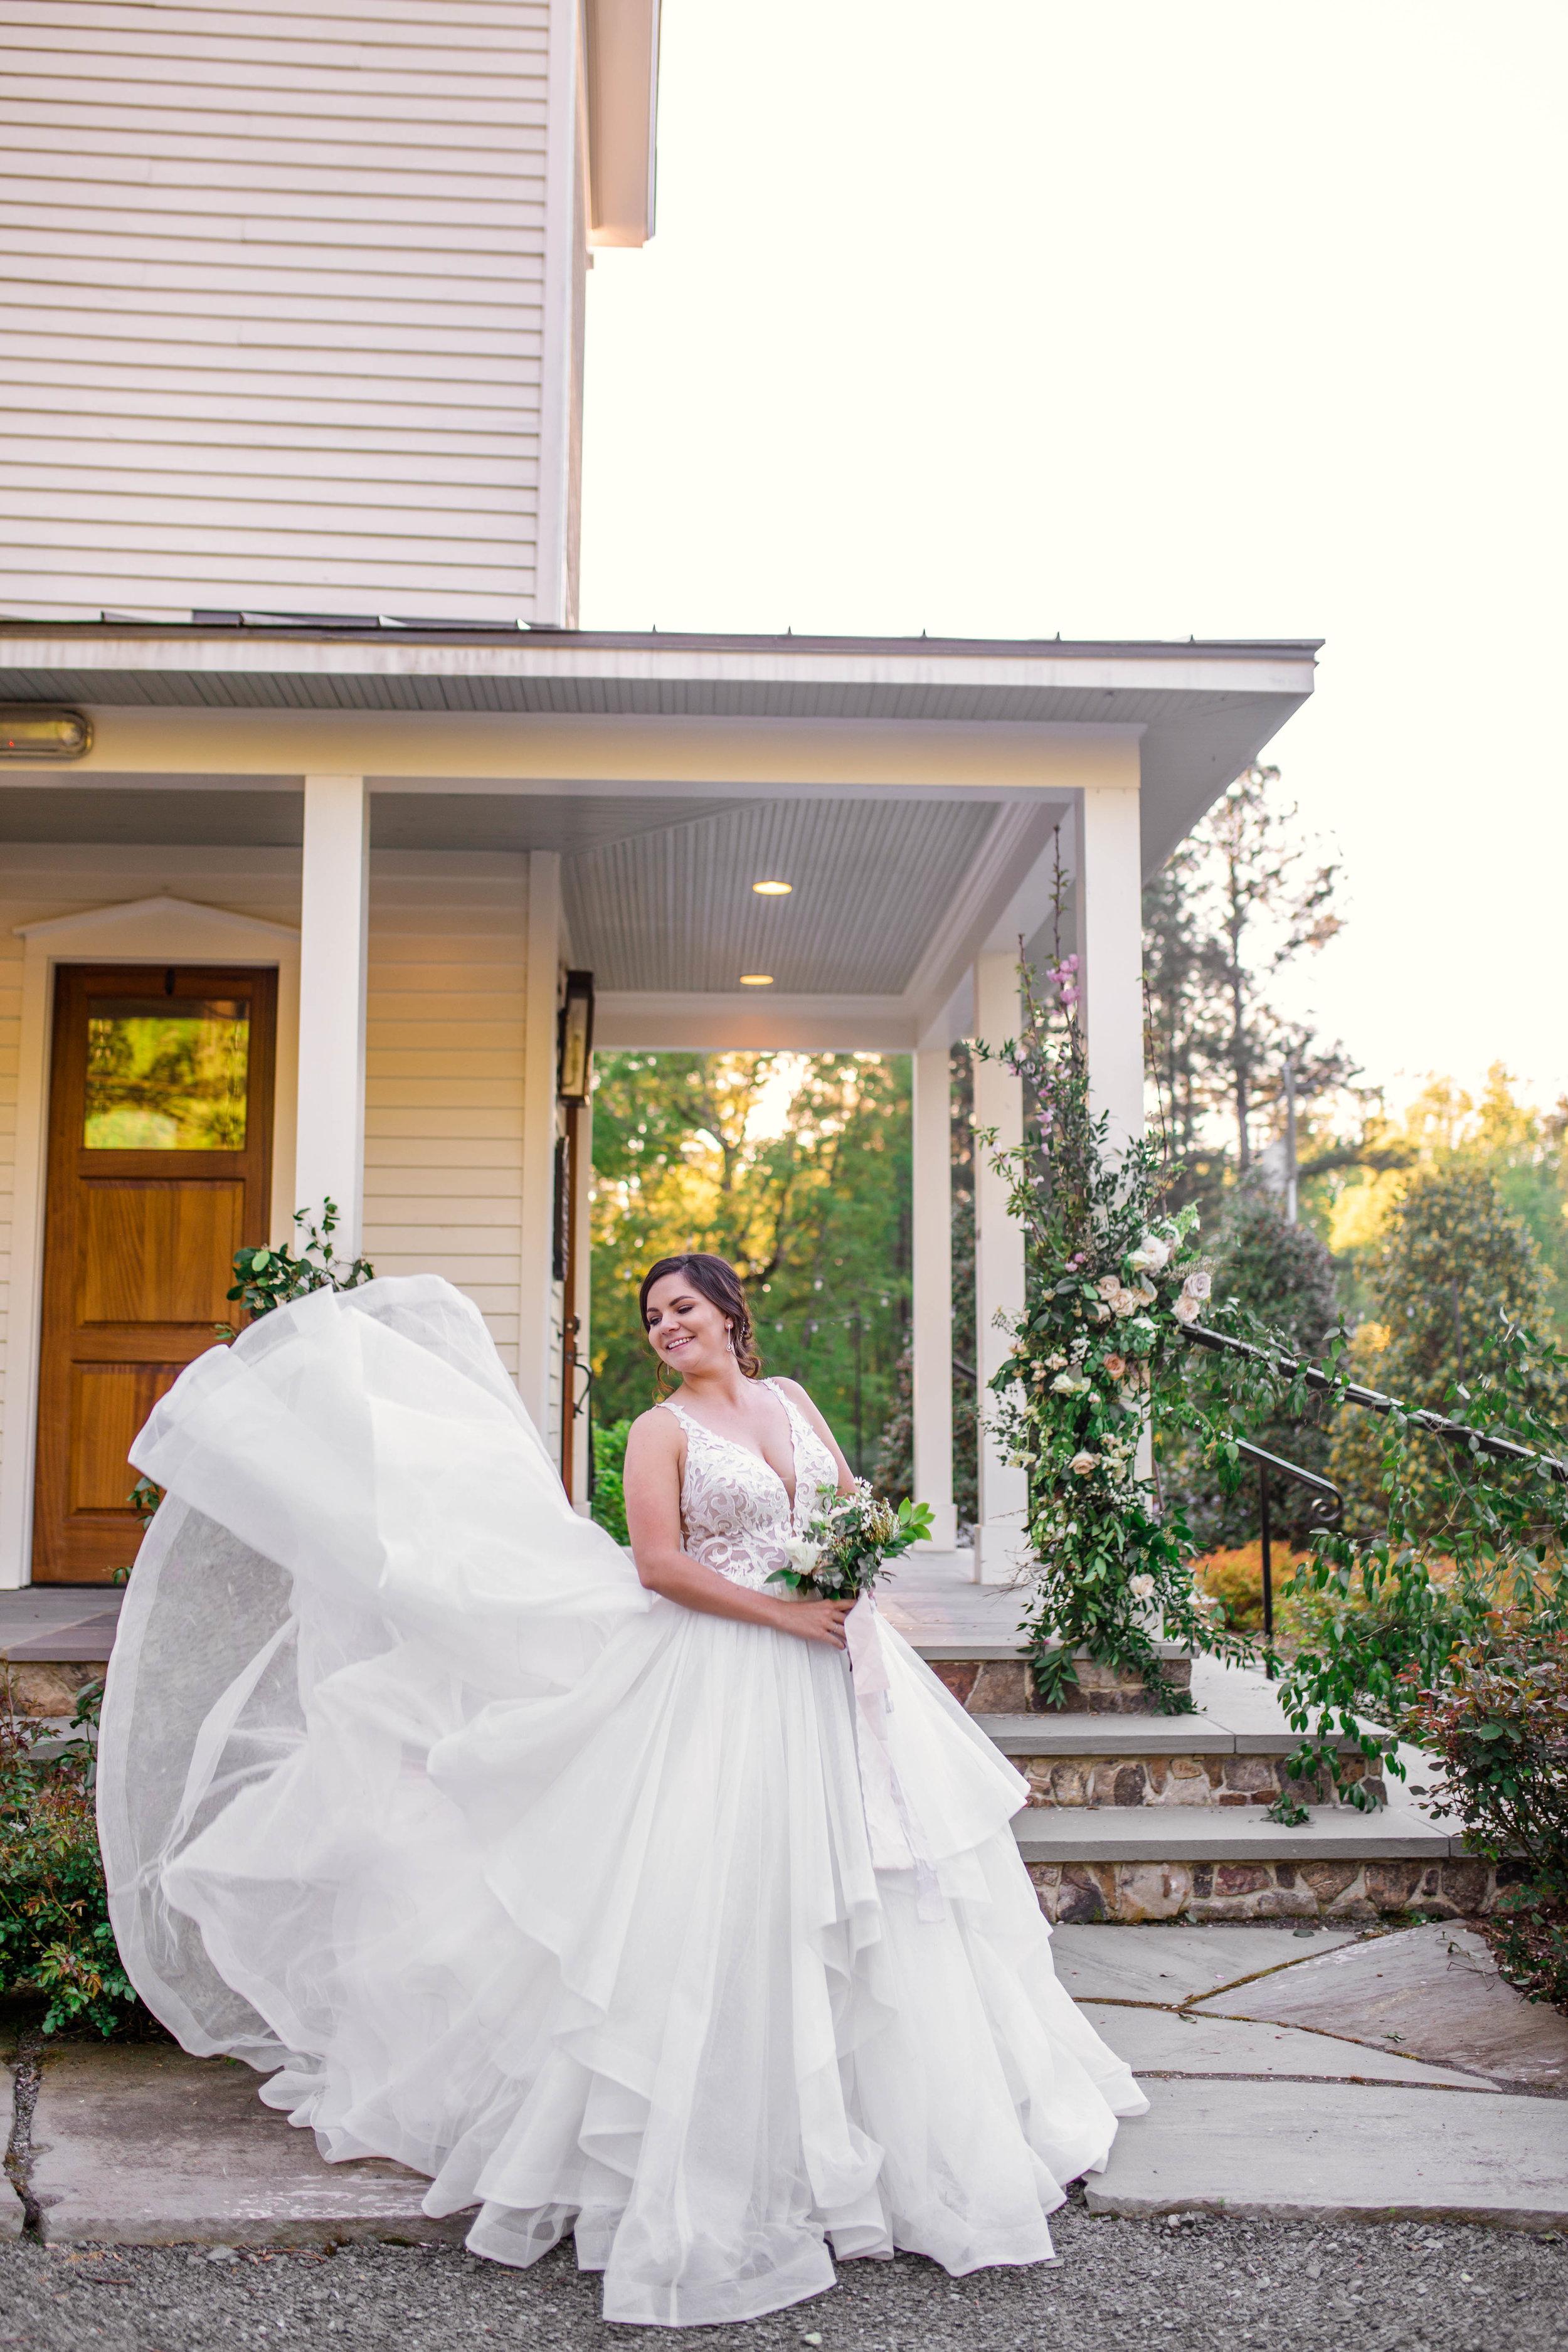 JohannaDyePhotography-couple-chapel-25.jpg